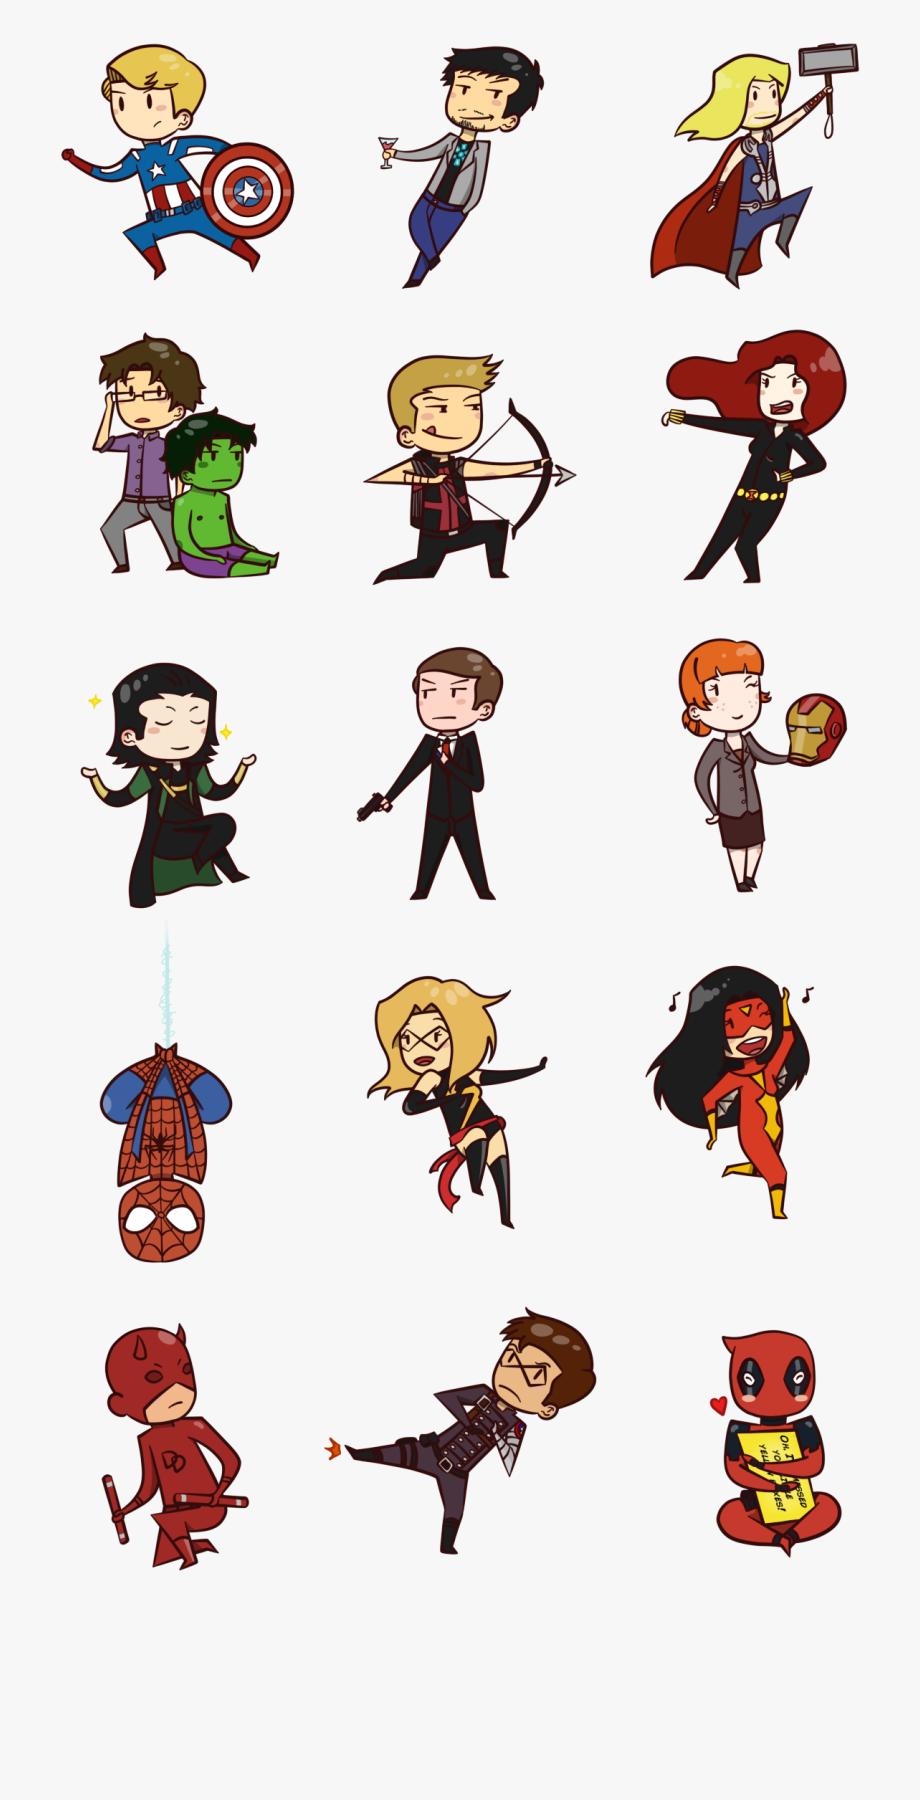 Chibi Marvel Superheroes.